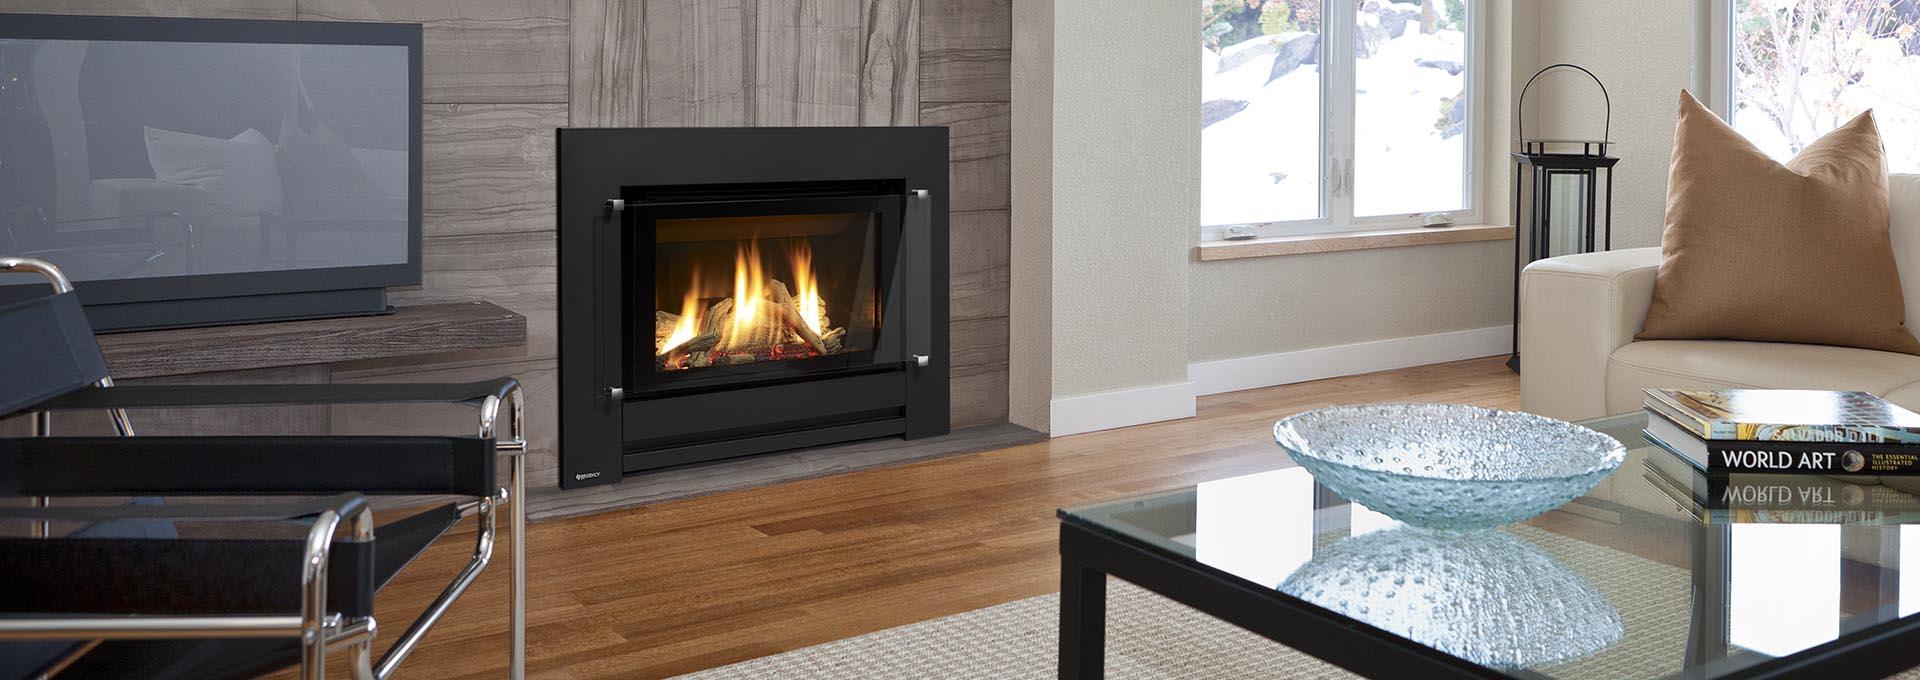 greenfire gfi300l gas fireplace inbuilt gas fireplace inbuilts